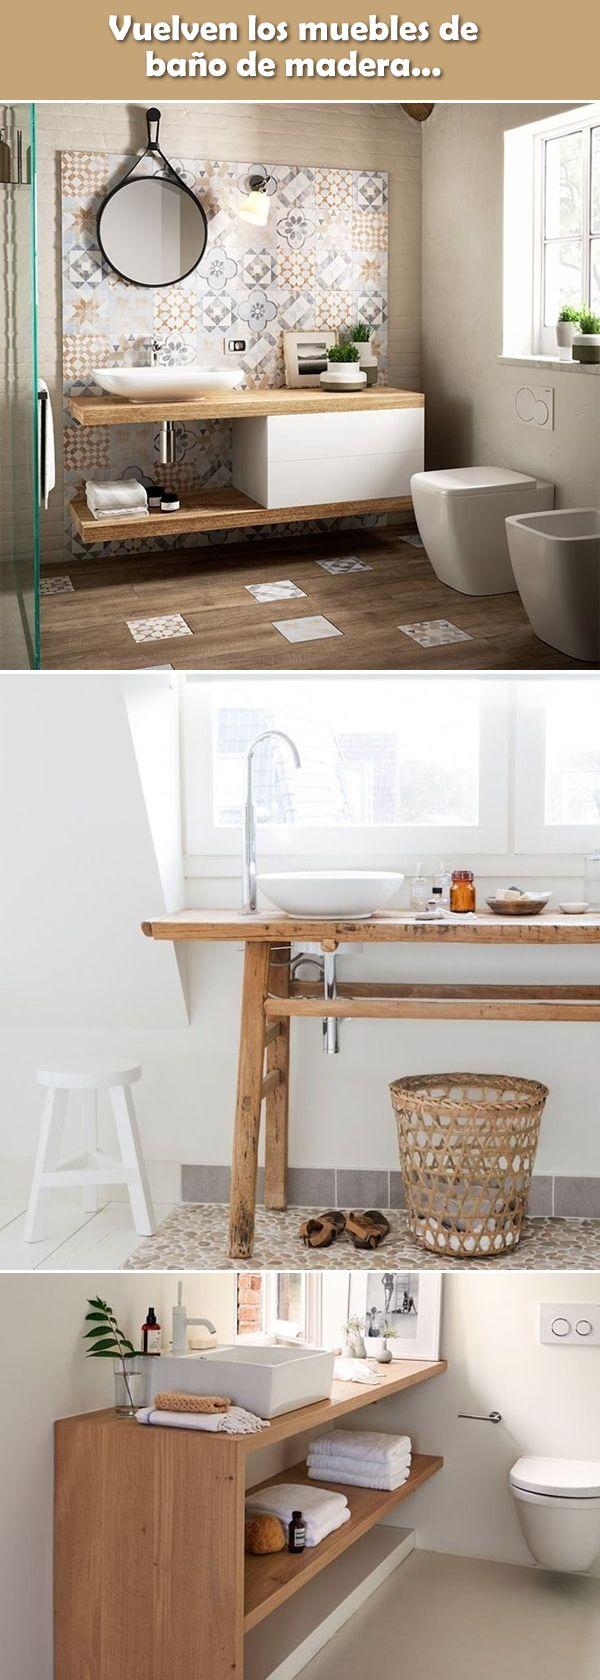 463 best ba os images on pinterest - Muebles de madera para banos ...